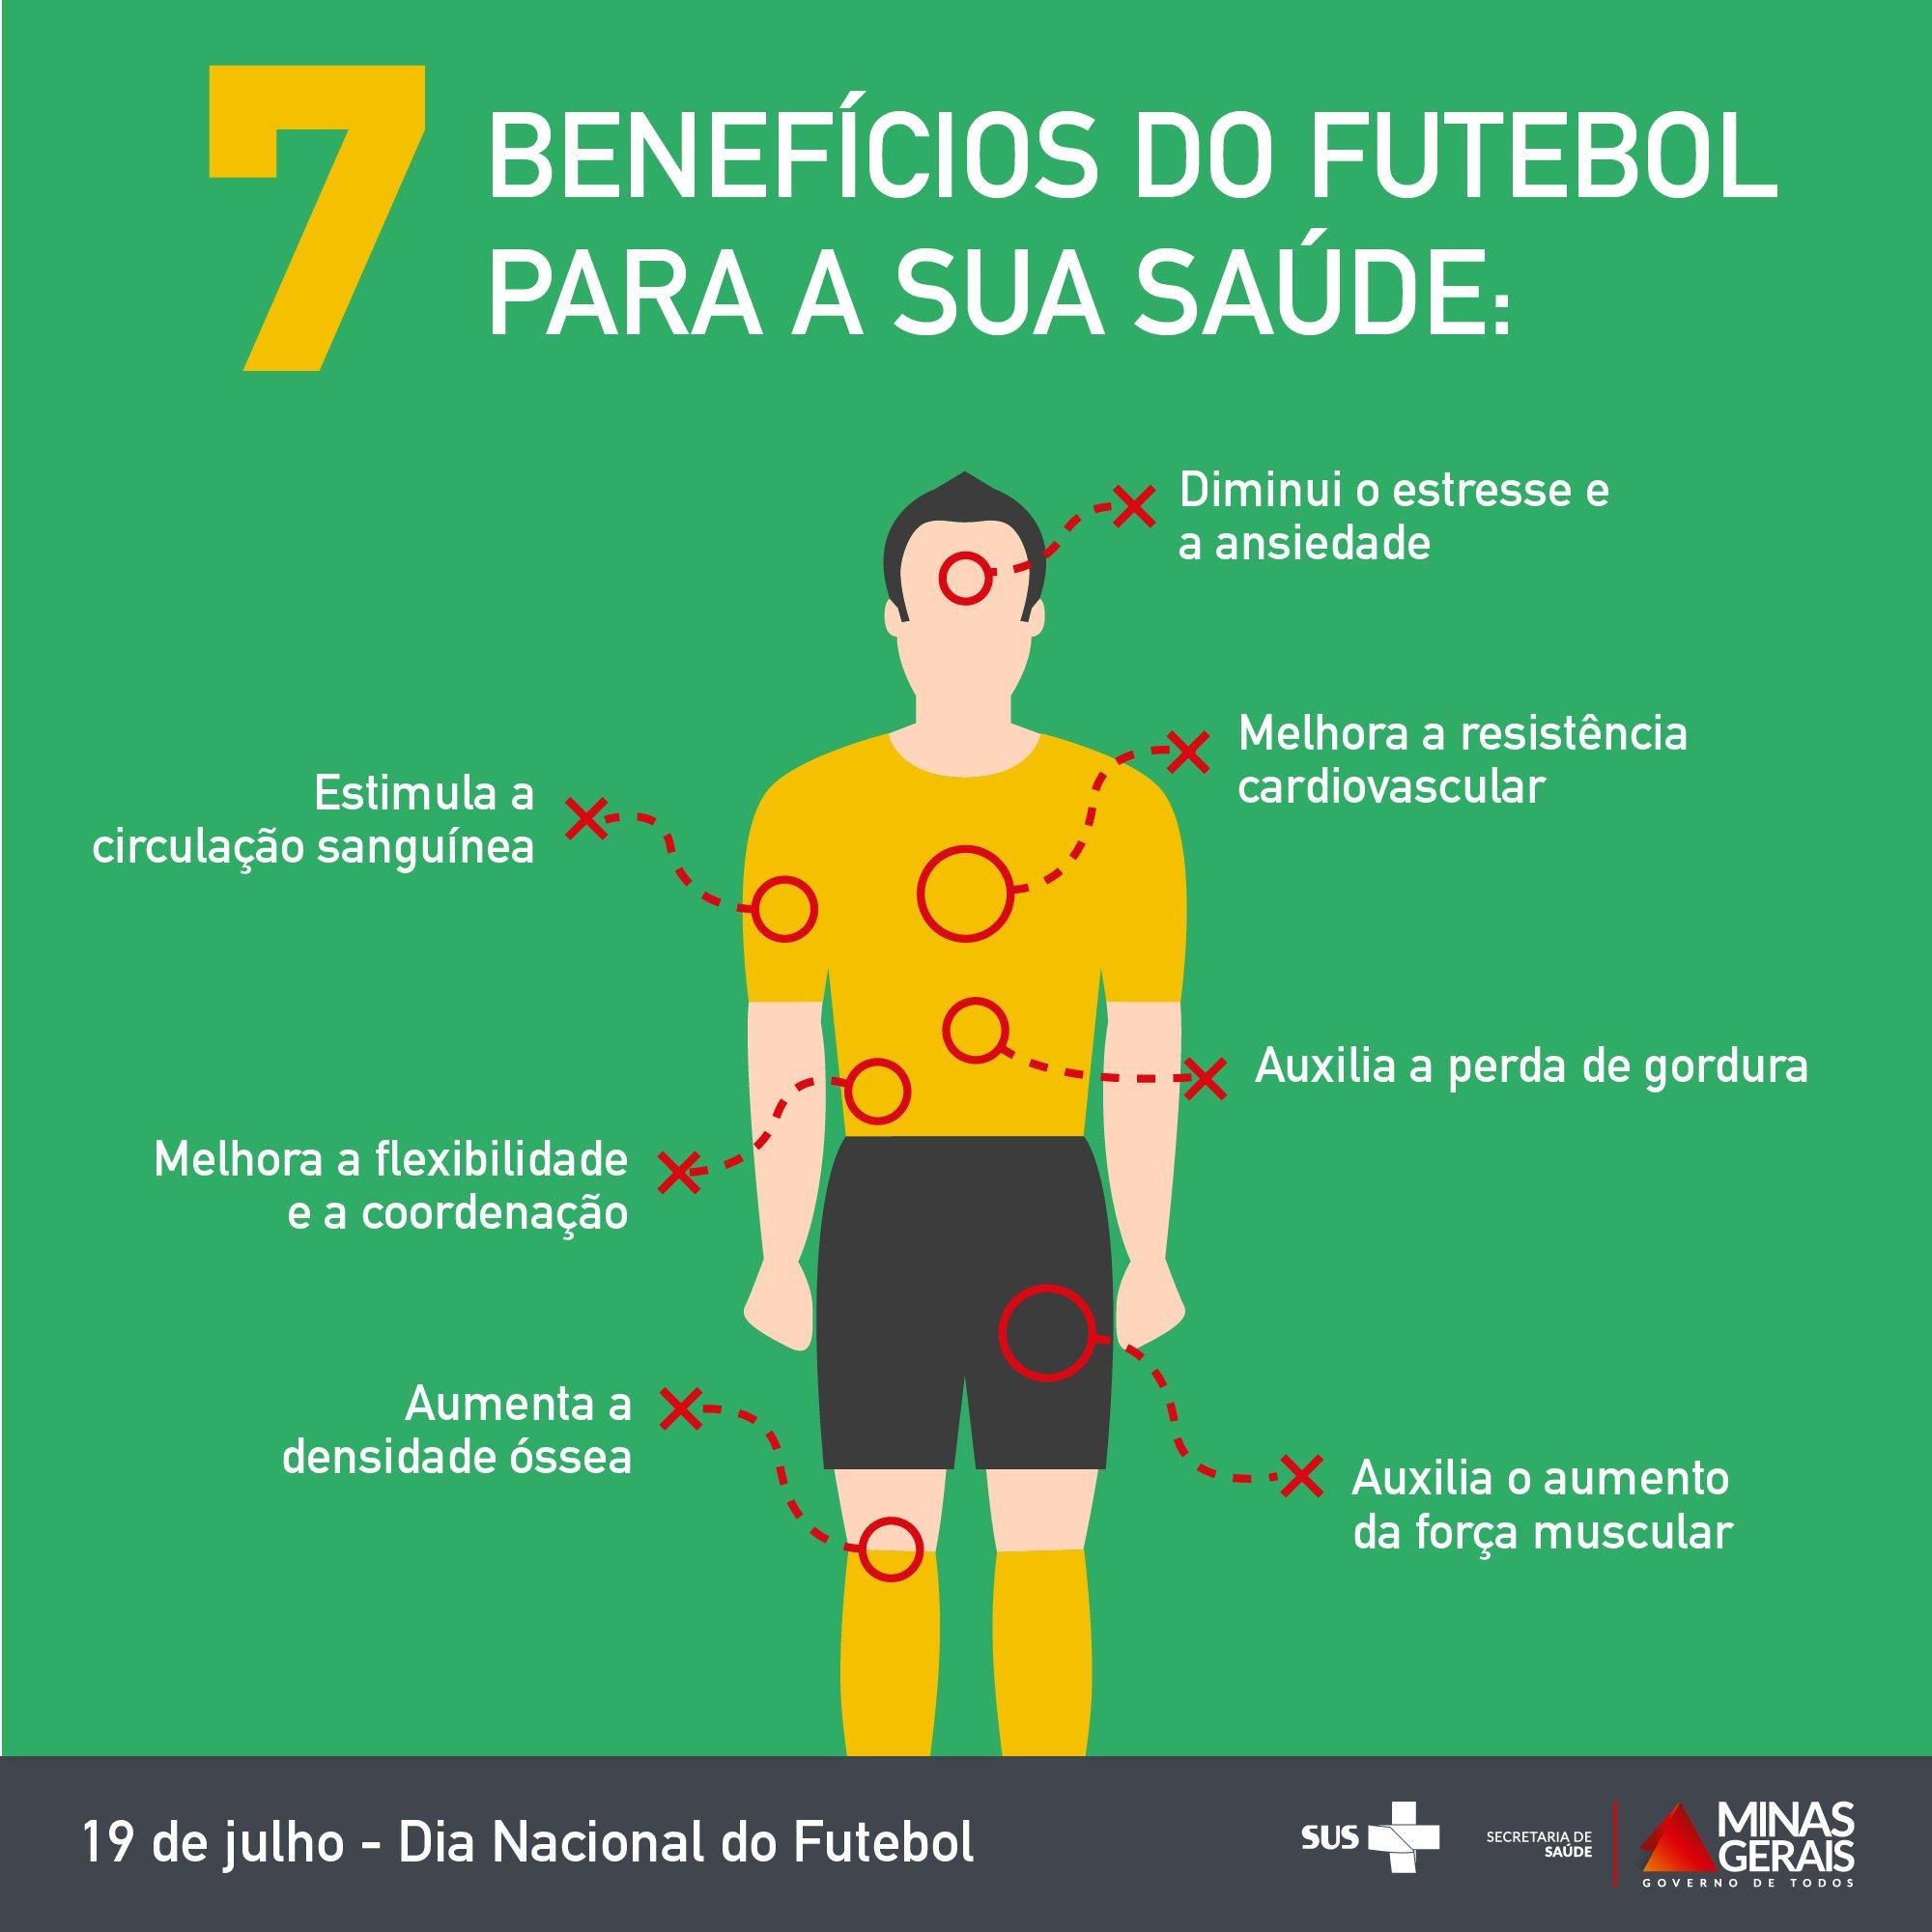 banner_beneficios_futebol_2016